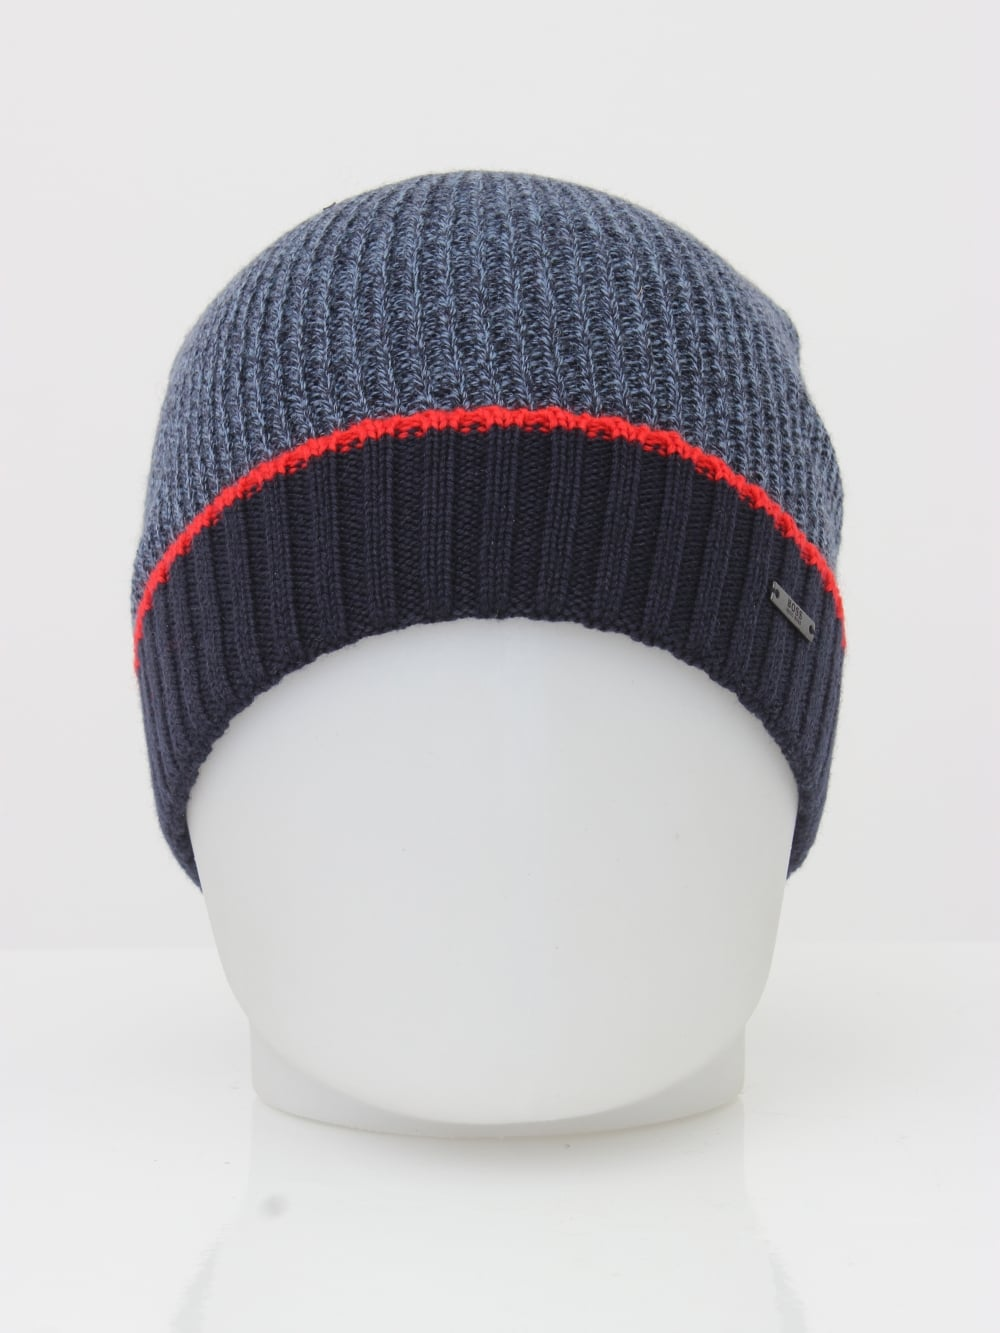 HUGO BOSS - BOSS Hugo Boss Frisk Hat in Navy - Northern Threads 388f2d1b90c